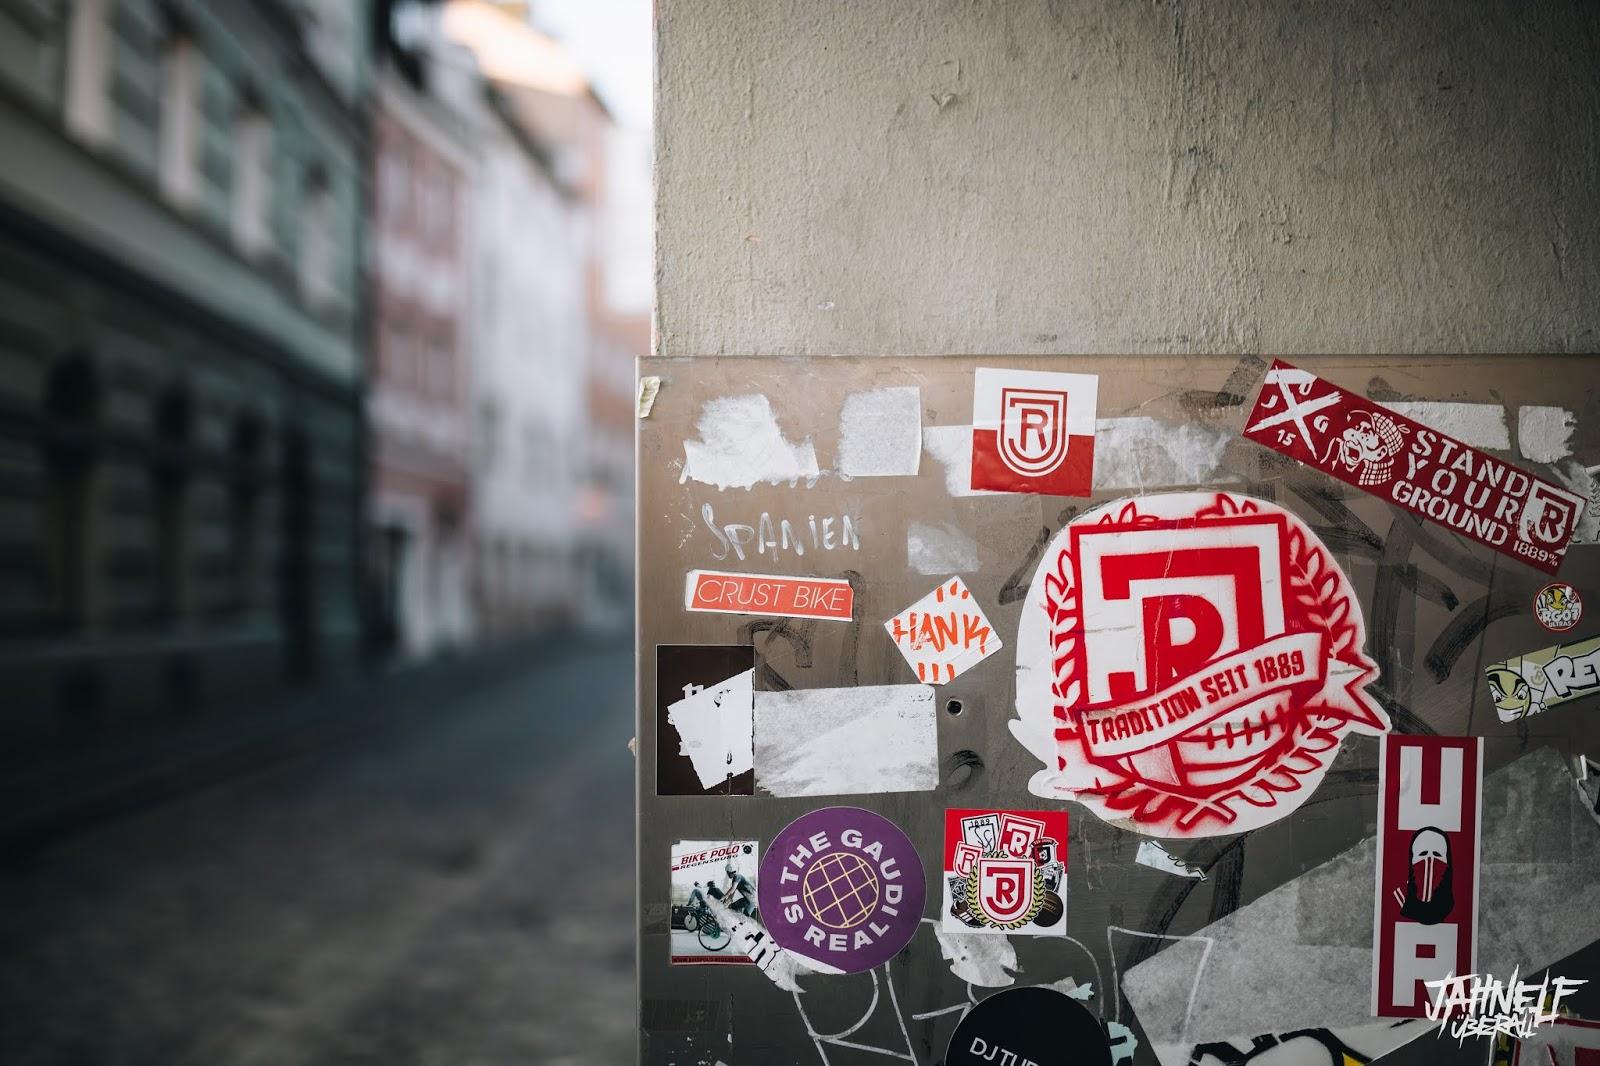 Unduh 44 Gambar Grafiti Ultras Paling Bagus Gratis Hd Pixabay Pro